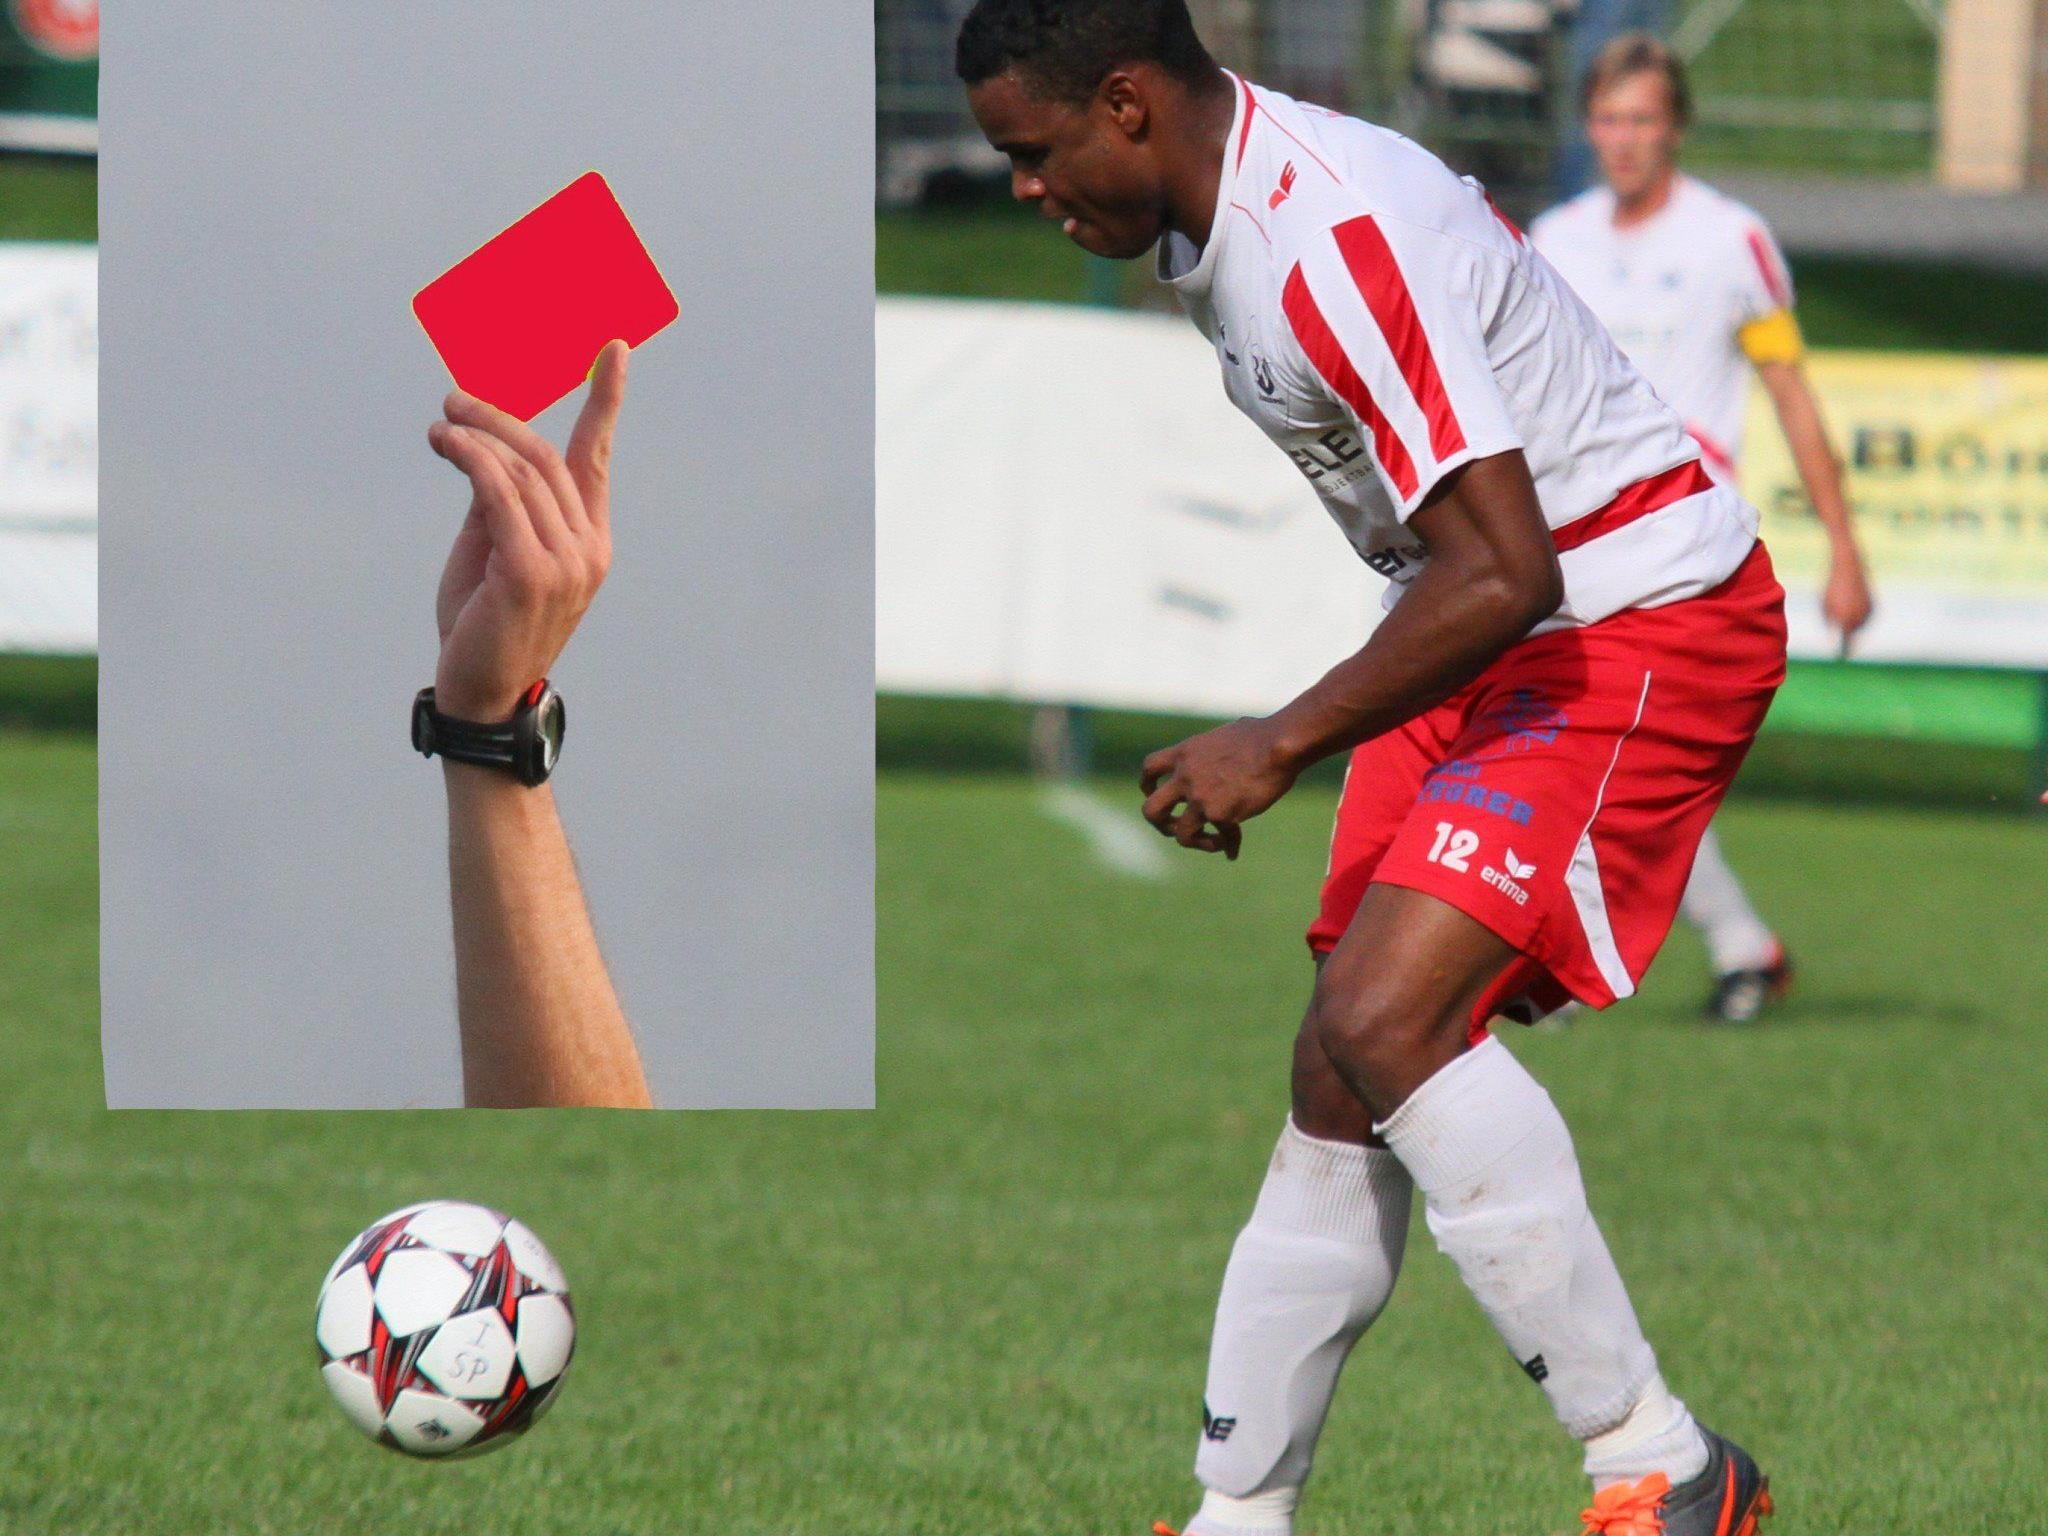 Der Rankweiler Stürmer Rafael Pereira Godoi muss sechs Spiele zuschauen.